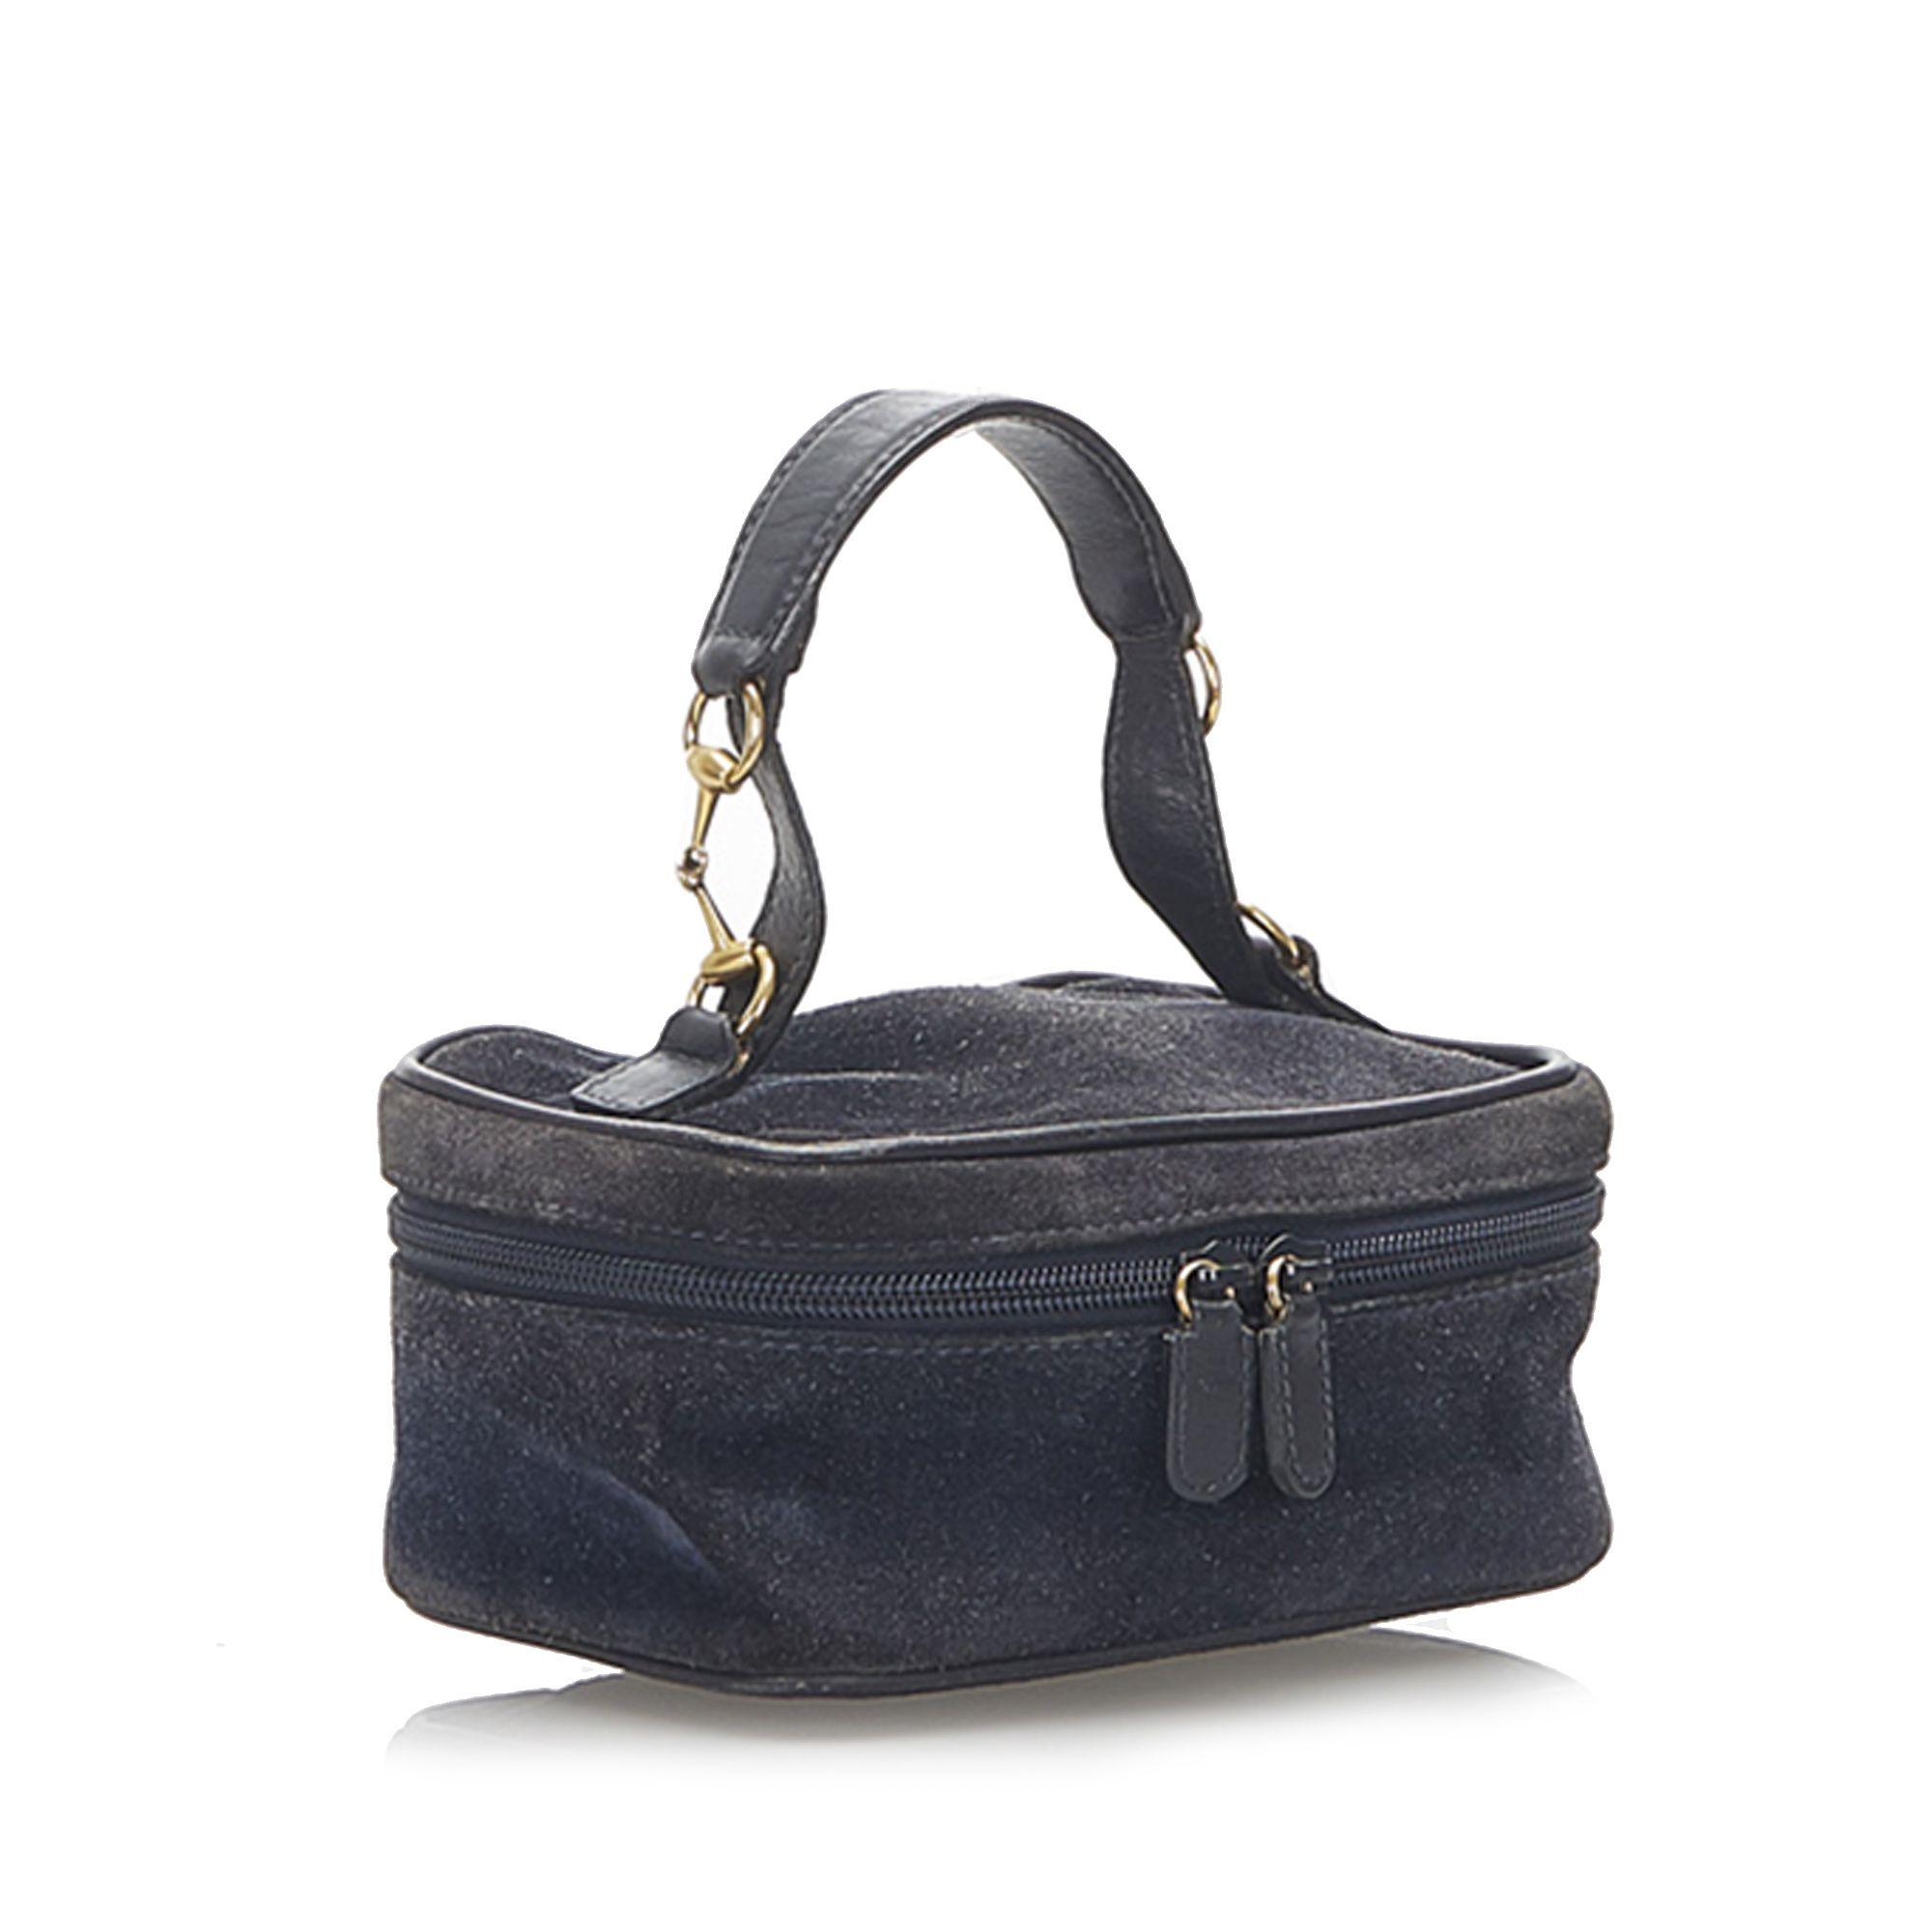 Vintage Gucci Horsebit Suede Vanity Bag Black